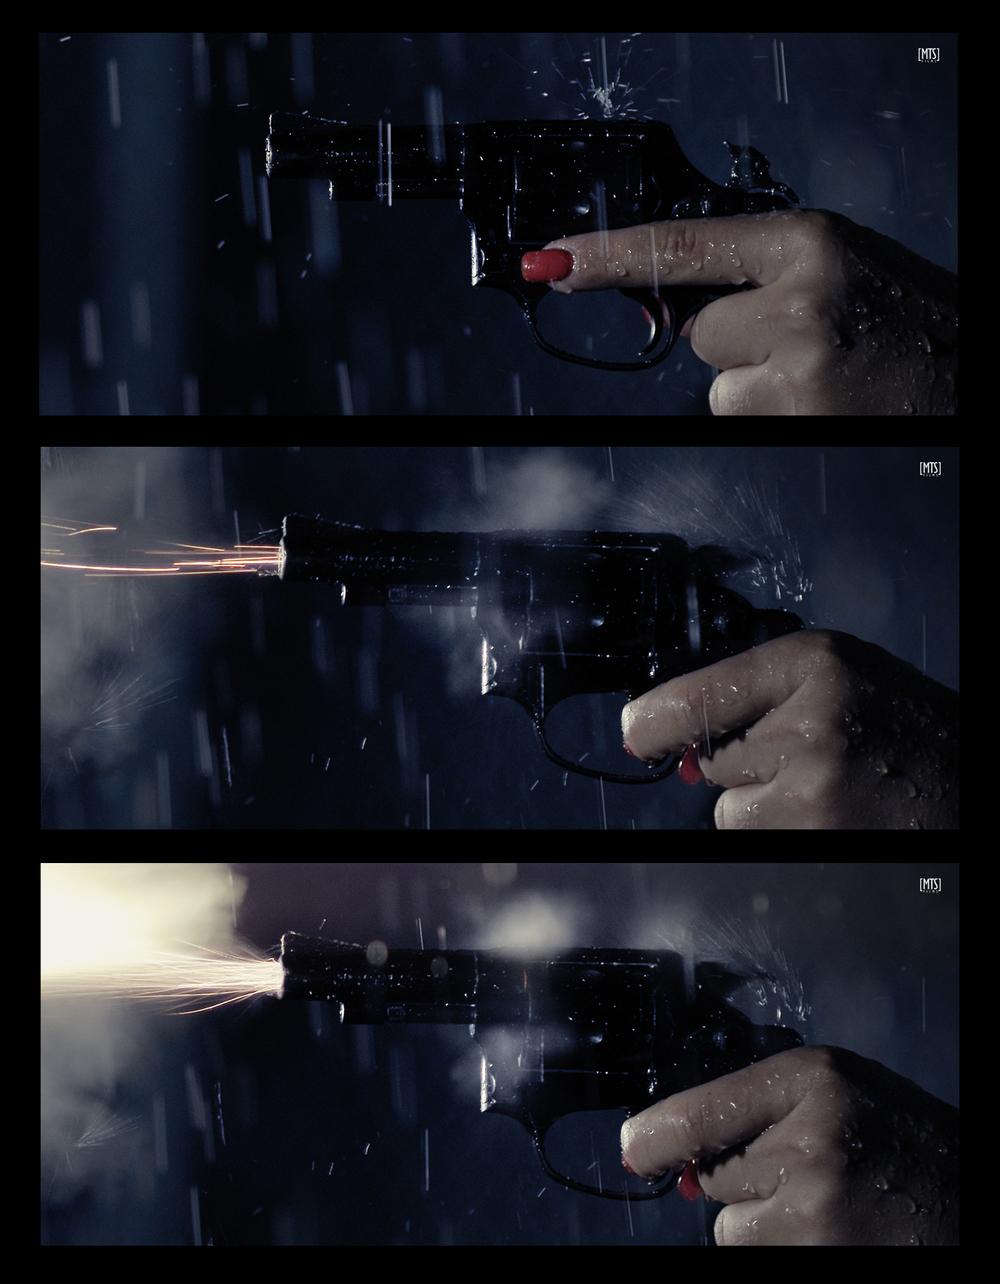 MatthewScott_RainScene_gunslide_01.jpg